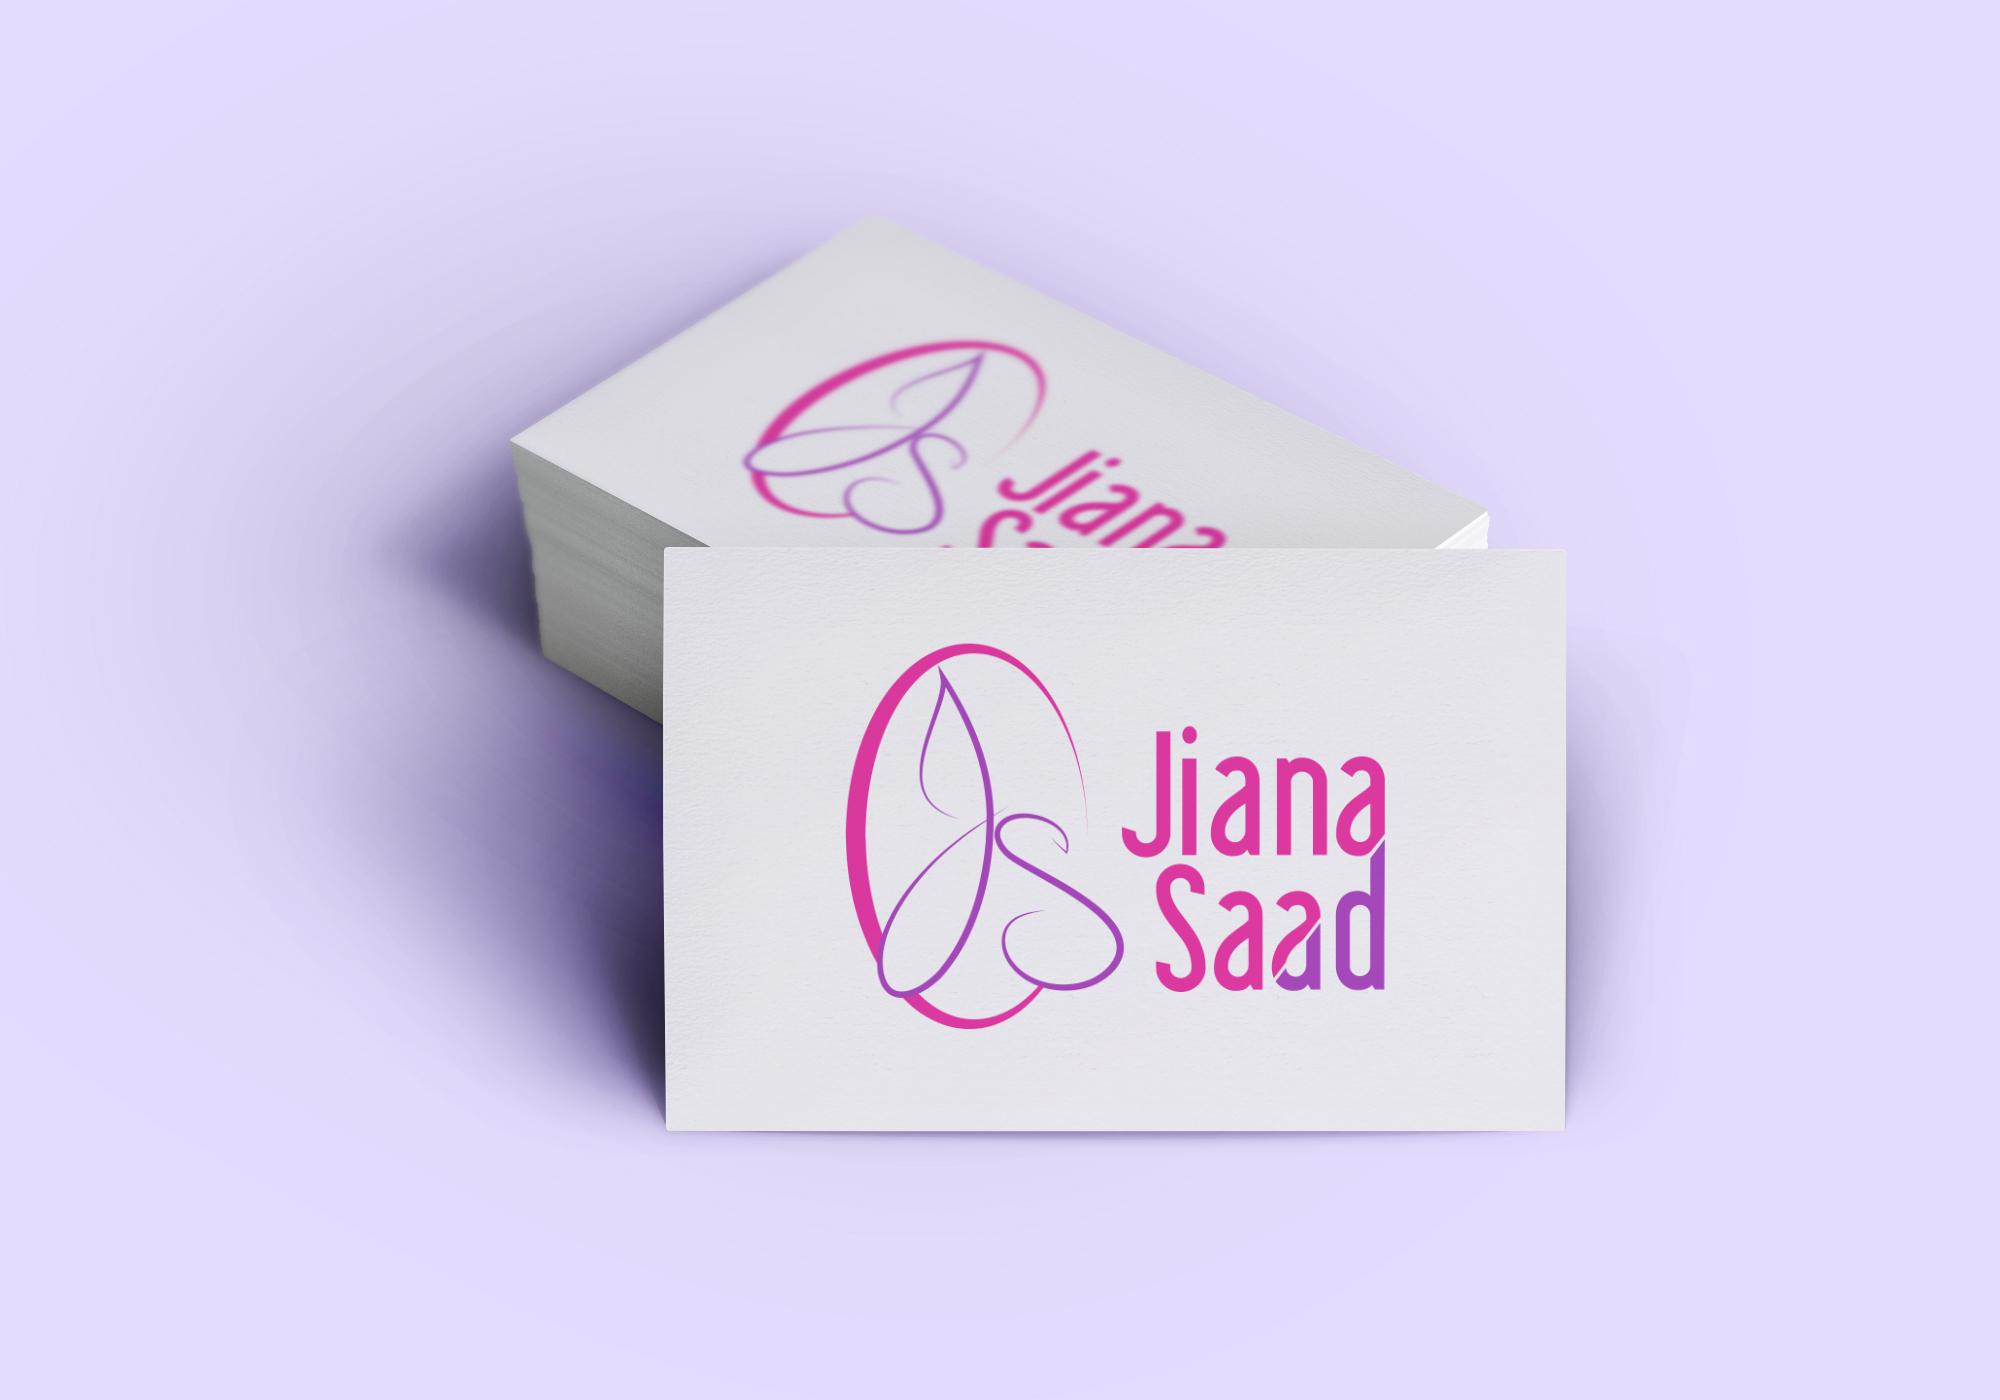 jiana